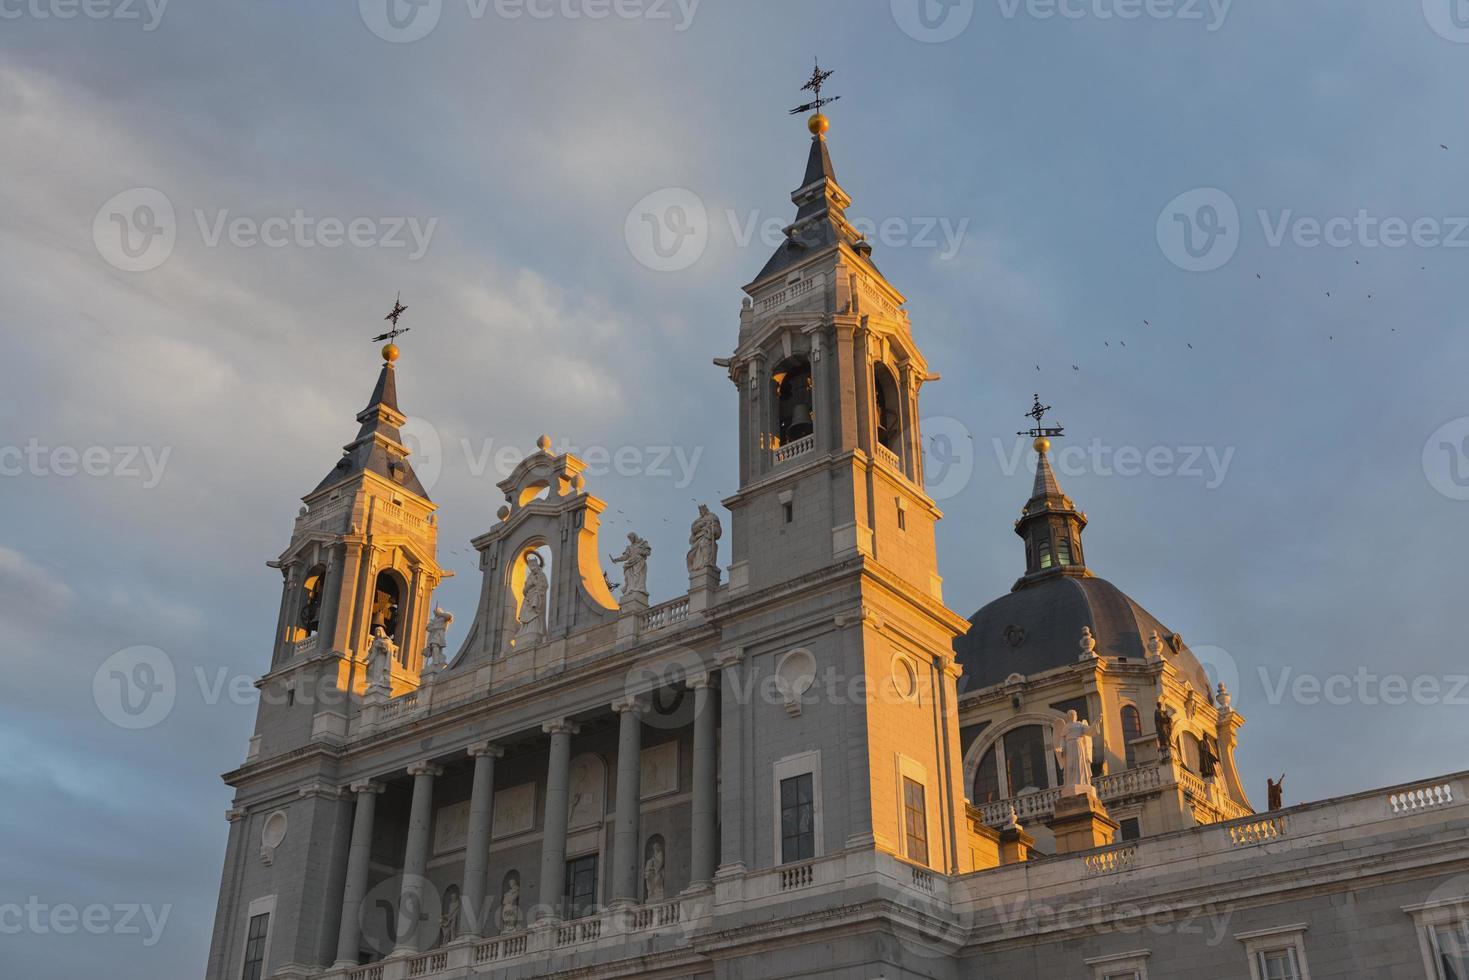 Almudena kathedraal in Madrid in de schemering foto